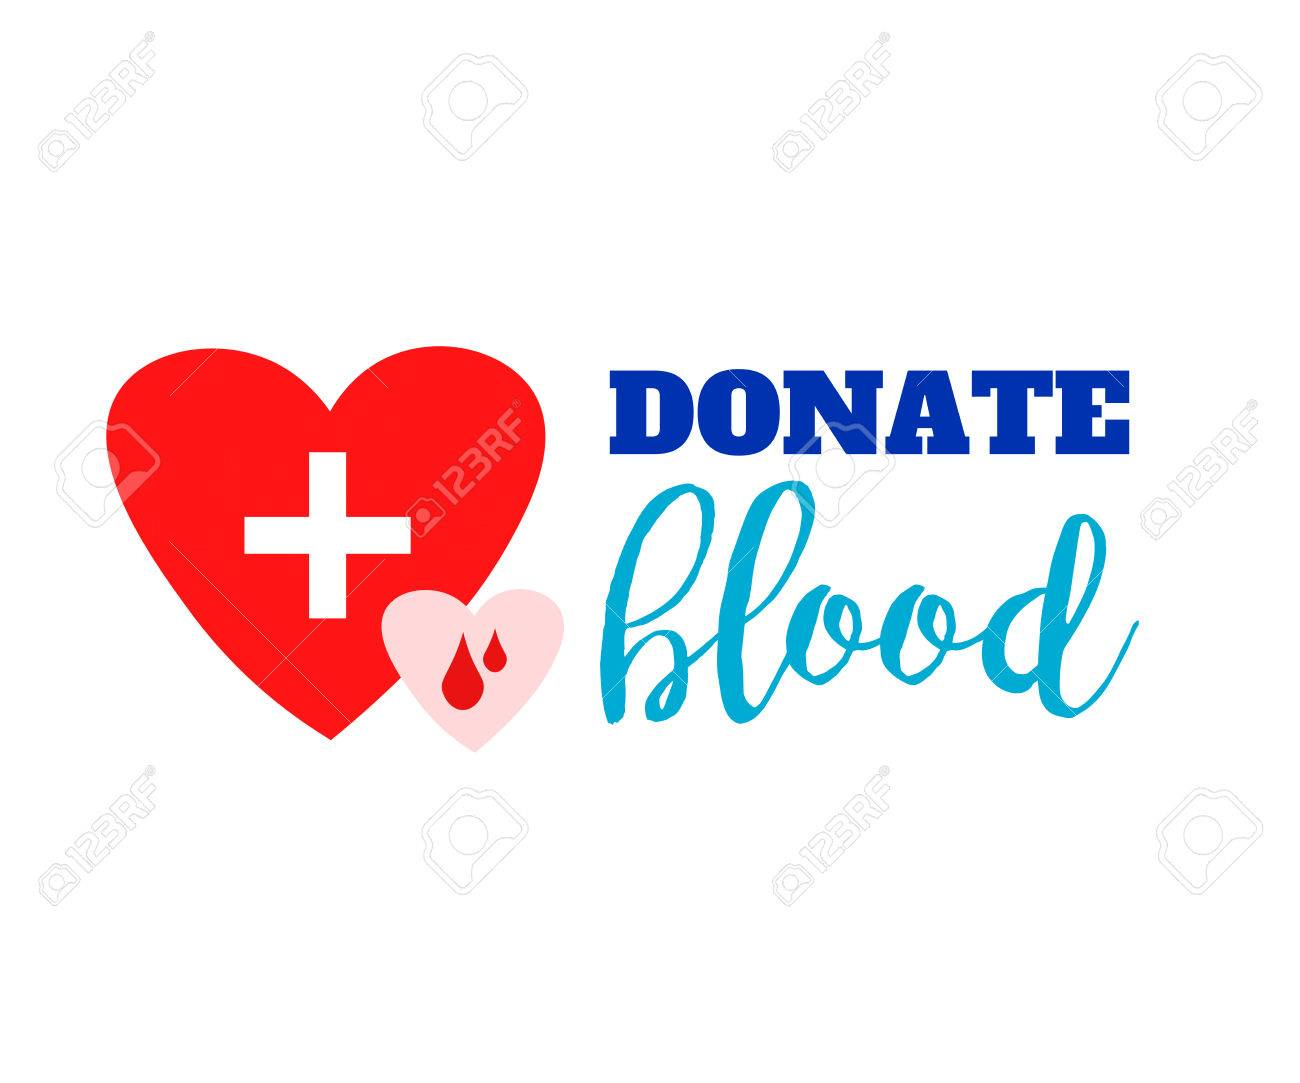 Blood donation symbol two hearts with cross and blood drops blood donation symbol two hearts with cross and blood drops connected and lettering emblem buycottarizona